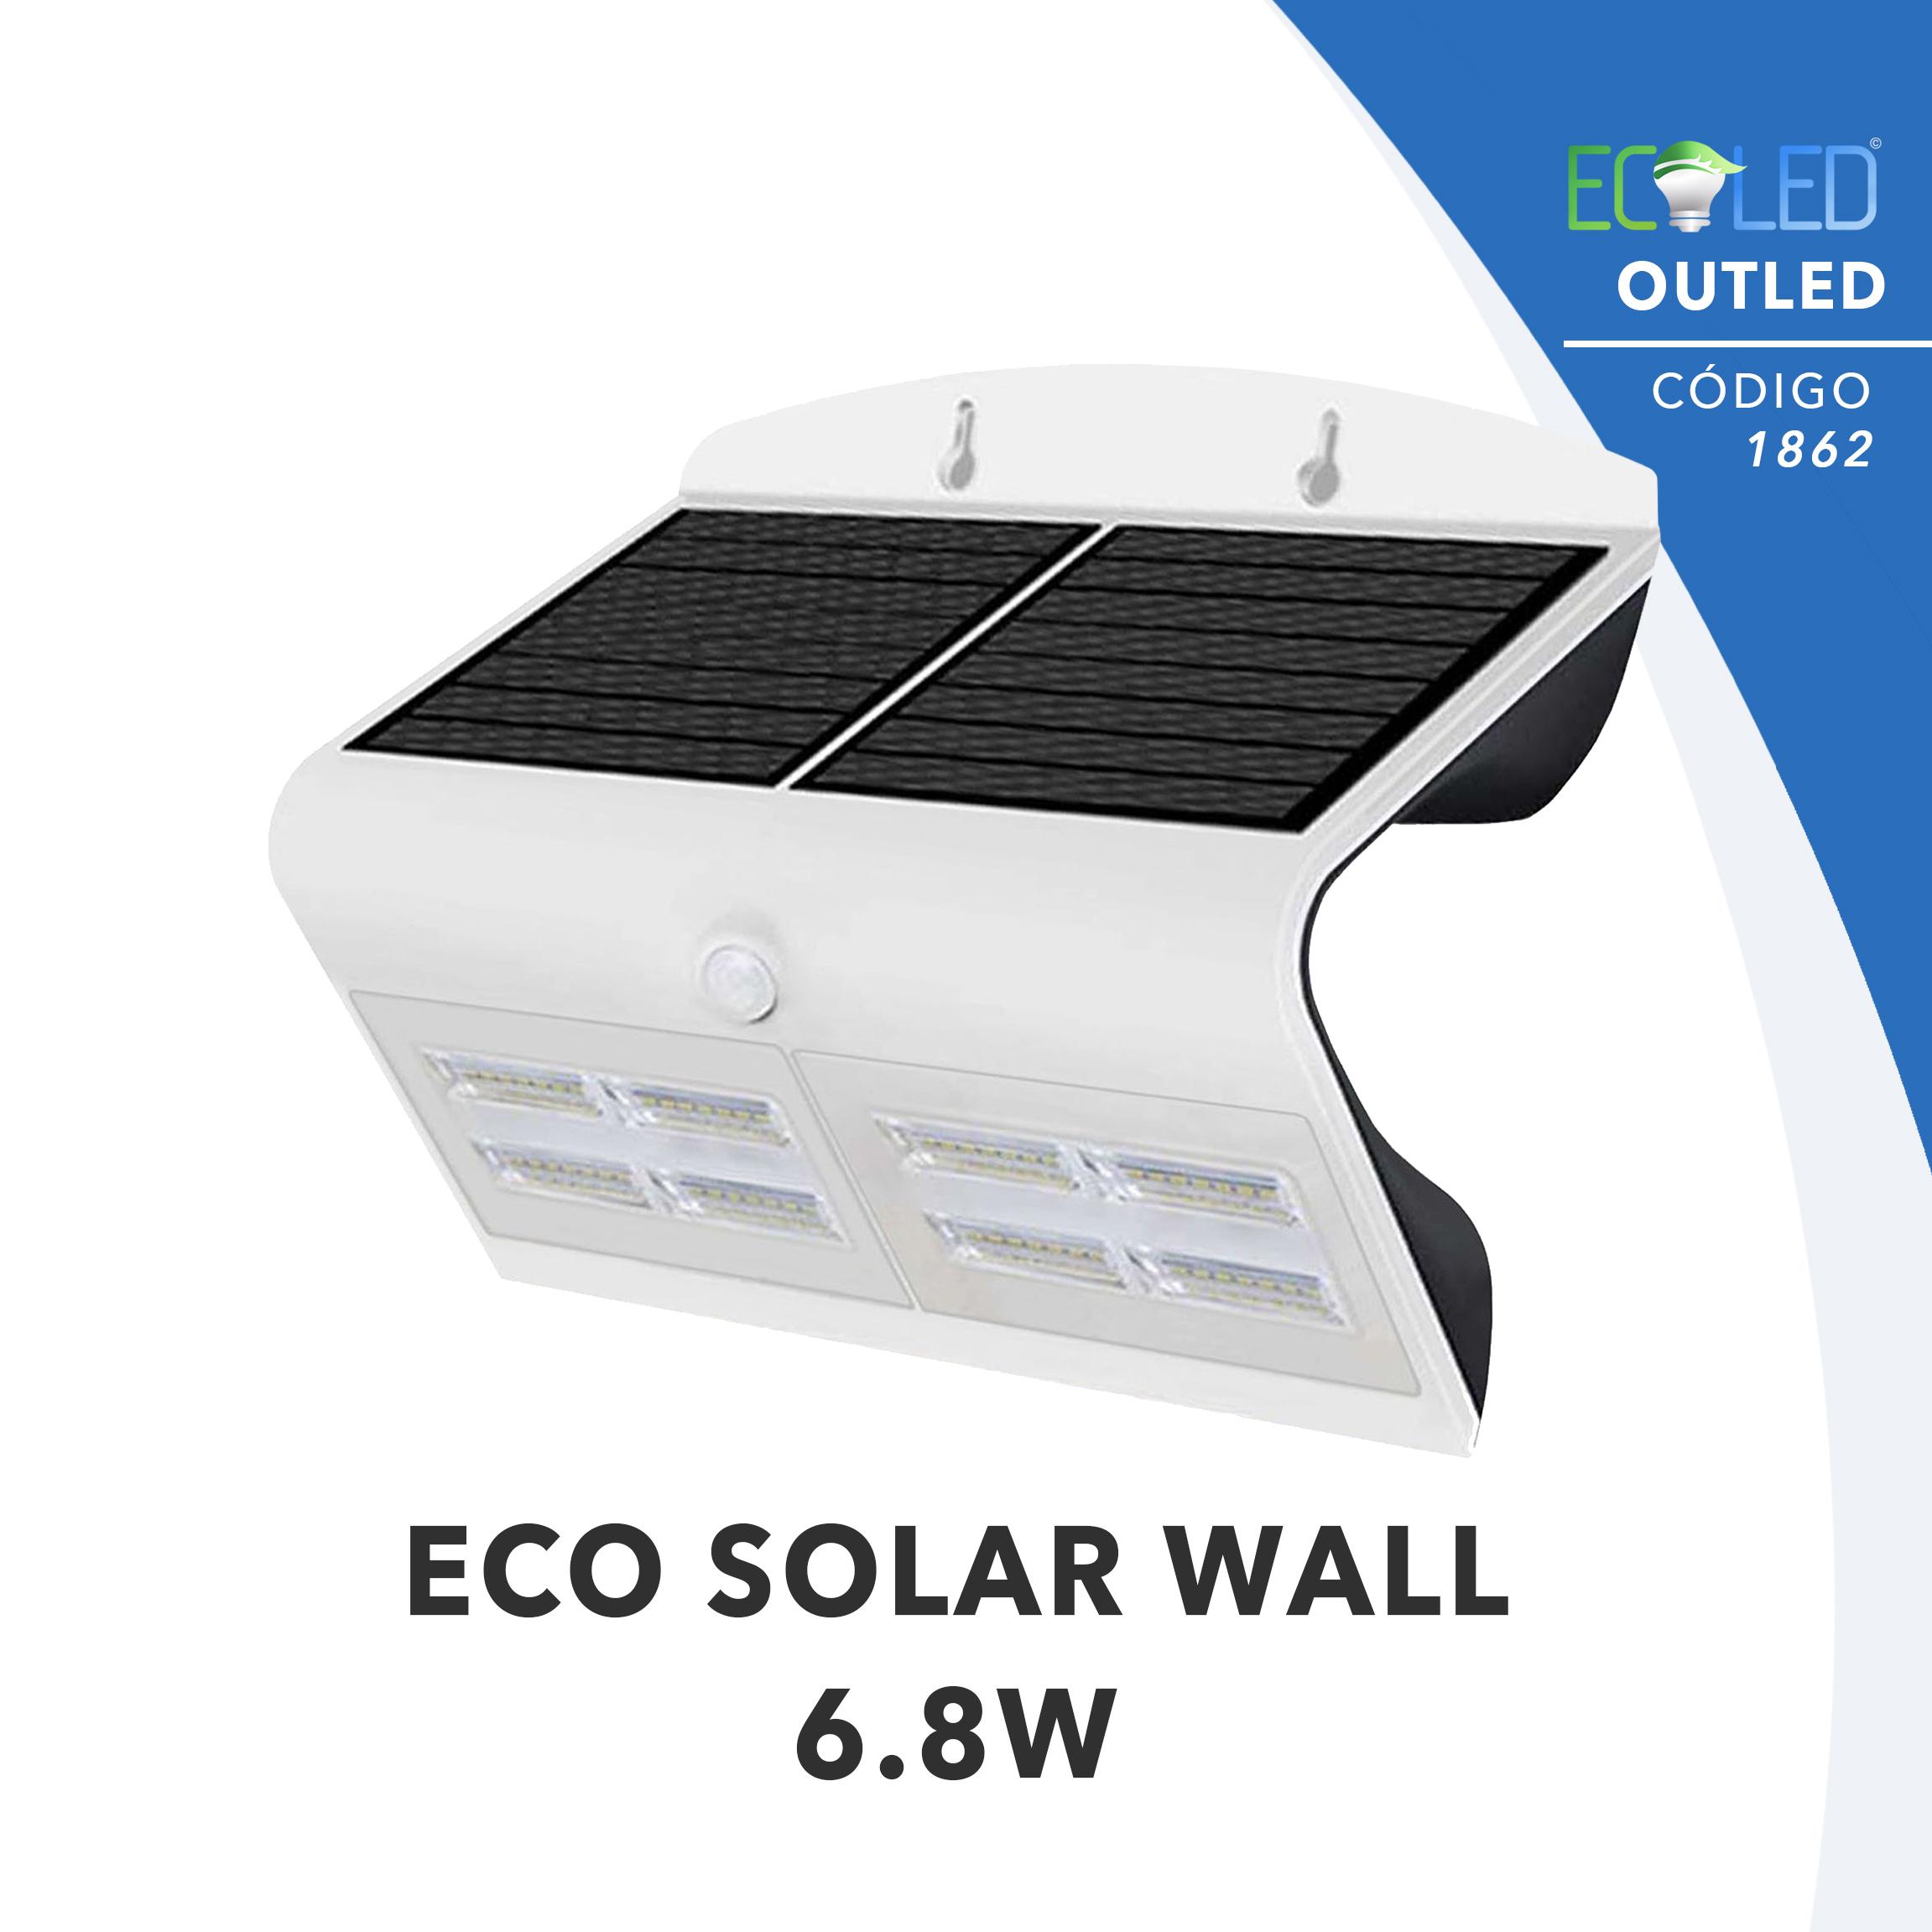 1862 · ECO SOLAR WALL-6.8W